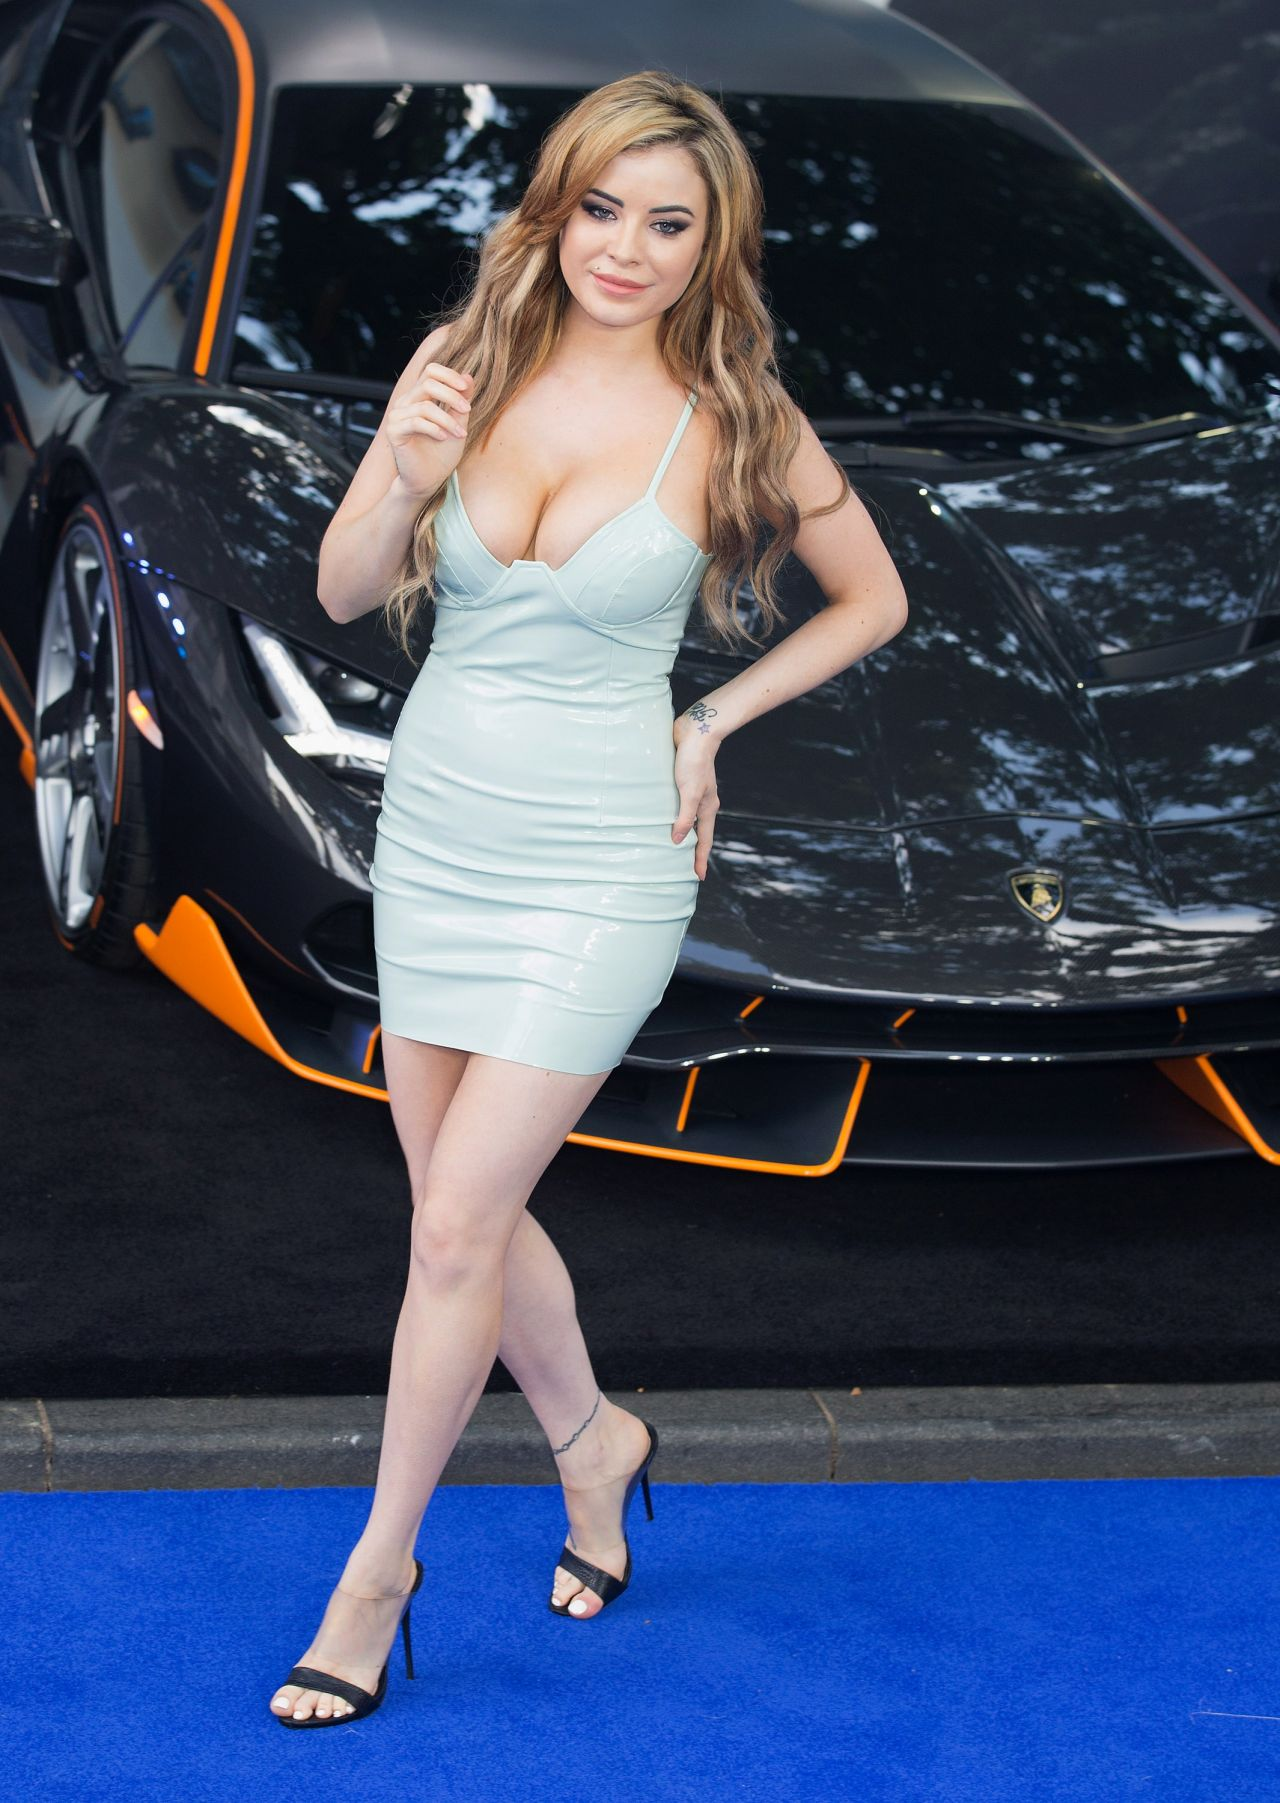 Sara underwood topless sexy 77 Photos gifs video Erotic photo Ashley greene bikini,Amy Adams sexy. 2018-2019 celebrityes photos leaks!